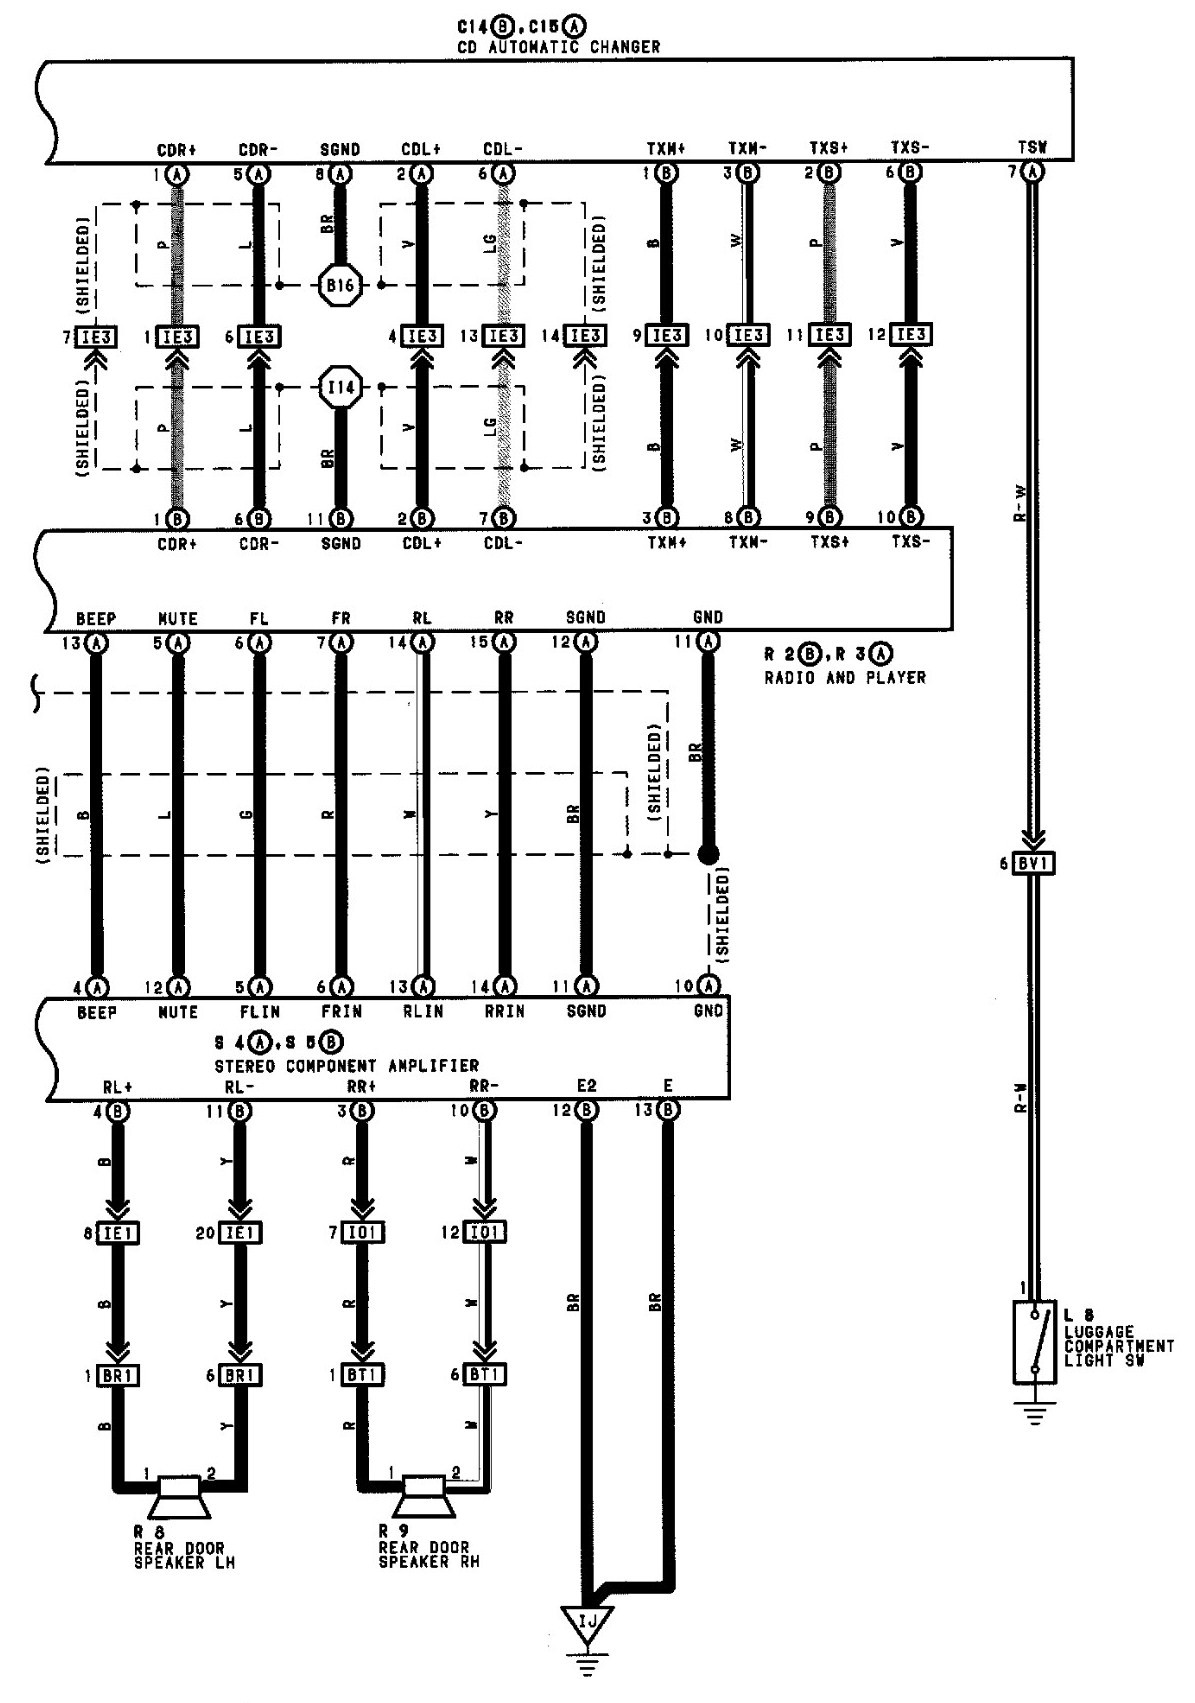 2000 toyota Camry Engine Diagram Stunning 1995 toyota Camry Wiring Diagram Everything You Of 2000 toyota Camry Engine Diagram